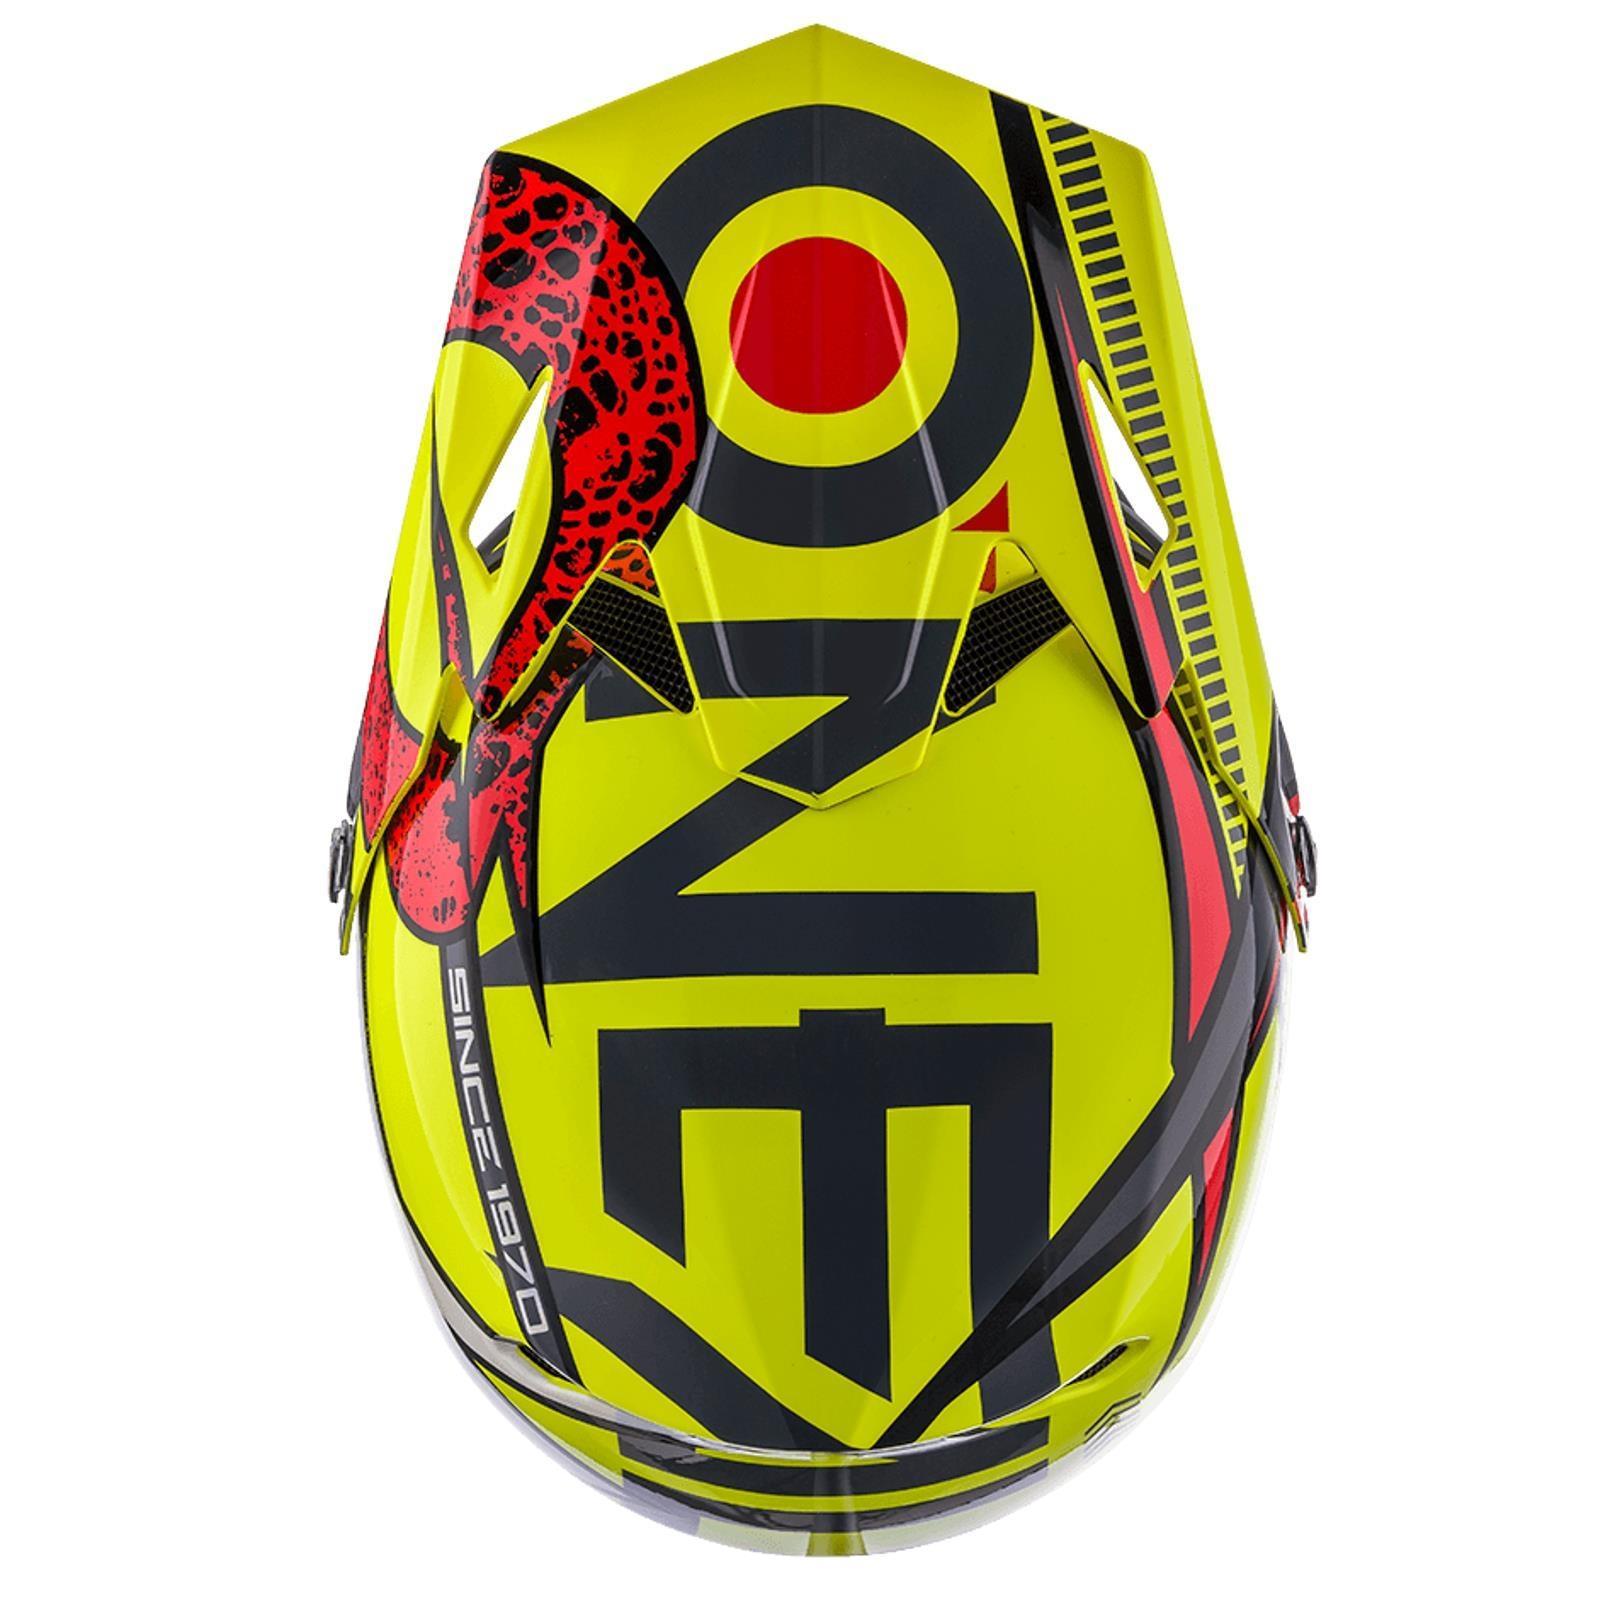 Indexbild 16 - ONeal-Sonus-Strike-Fahrrad-Helm-All-Mountain-Bike-MTB-Downhill-Fullface-Fidlock